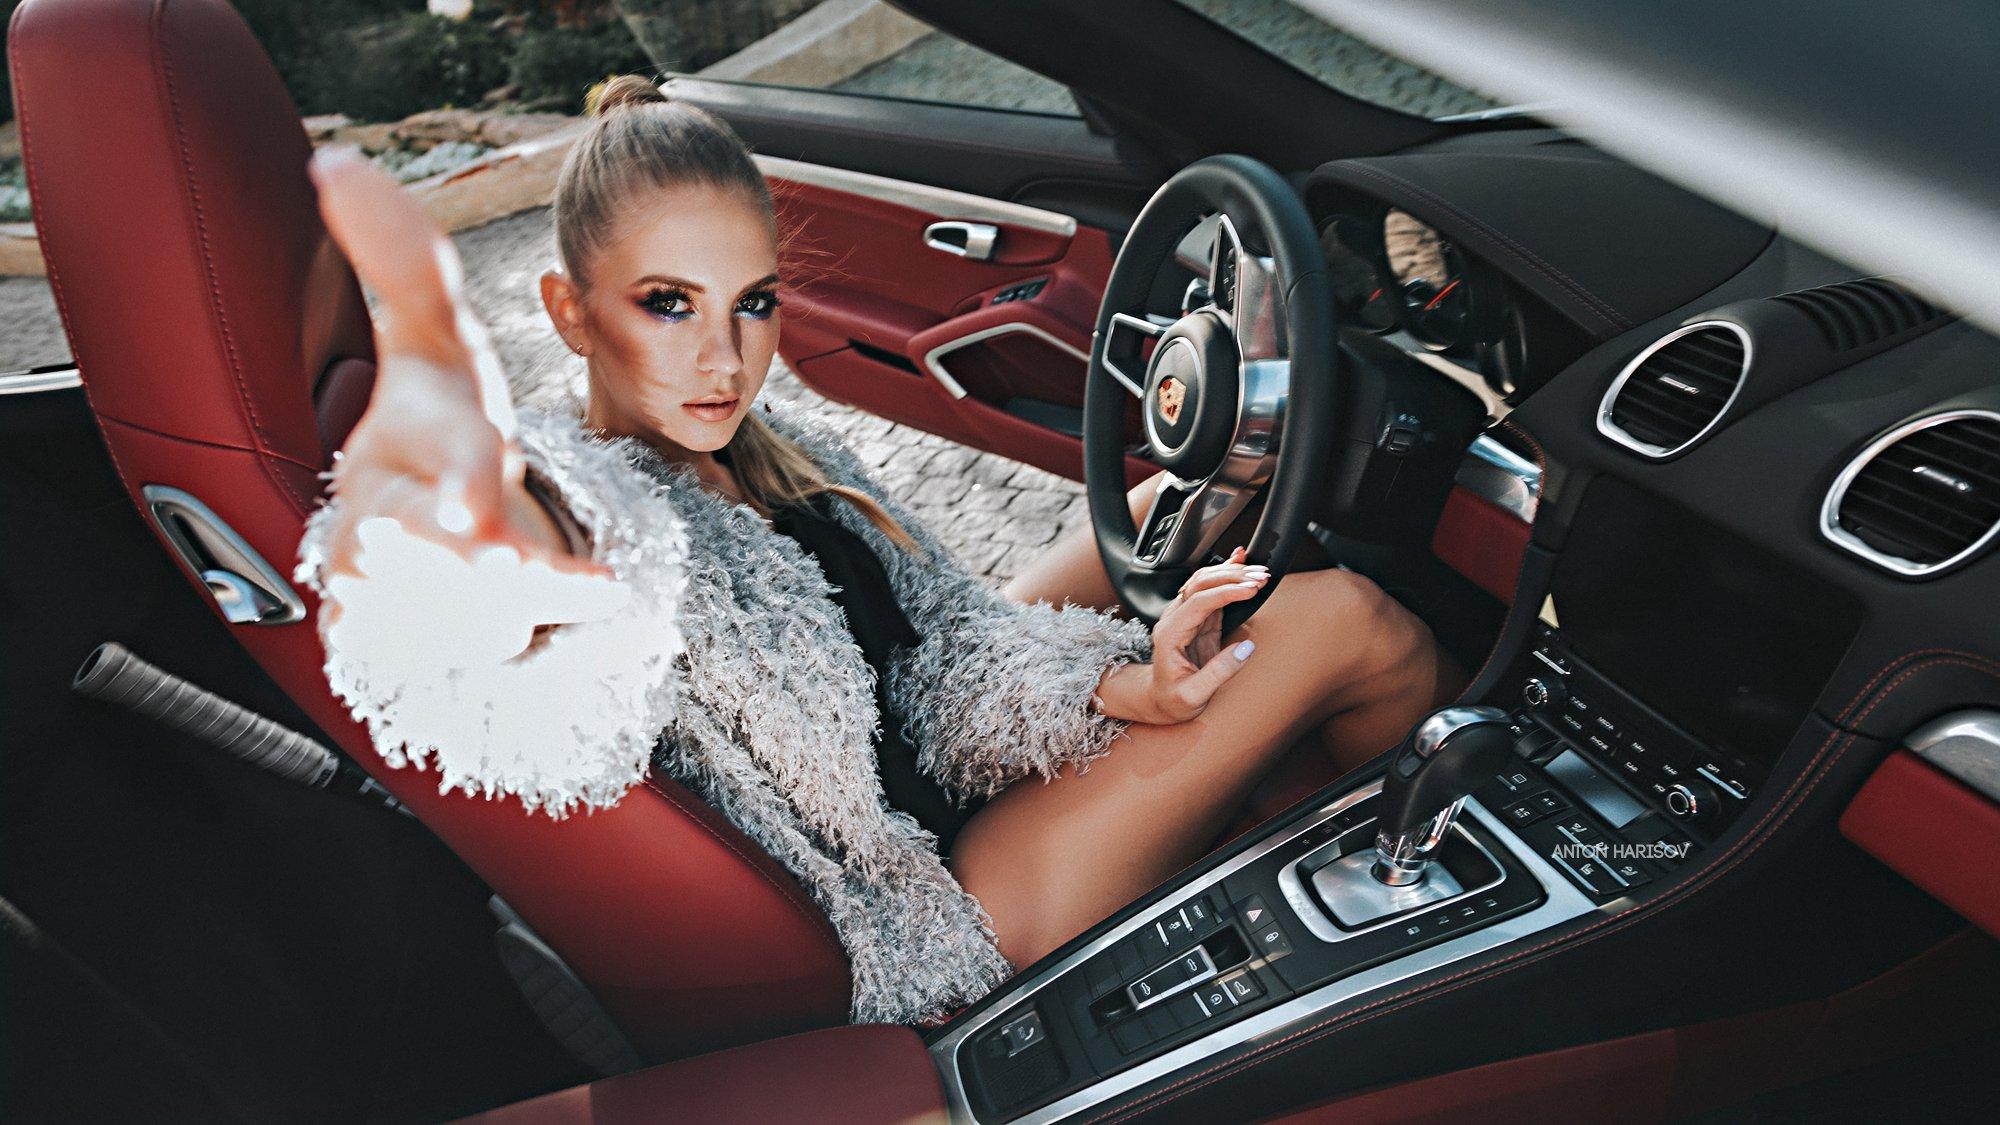 portrait, girl, beauty, eyes, russian, canon, fashion, woman, art, sexy, femme, movie, mood, cinematic, inspiration, daylight, popular, post-processing, antonharisov, fotoshi, portrait photography, fashion model, Антон Харисов